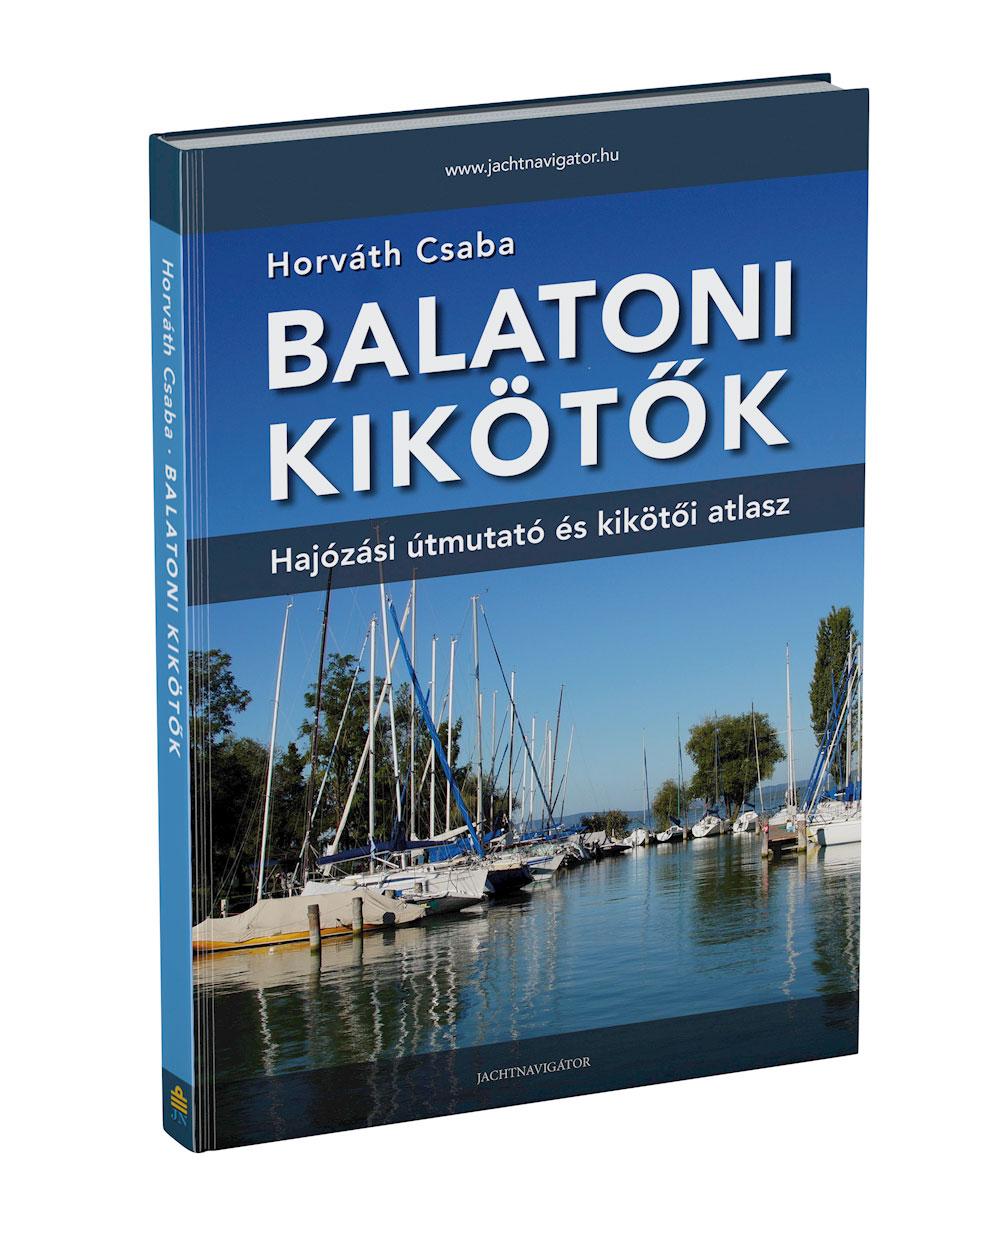 Balatoni kikötők (2021)